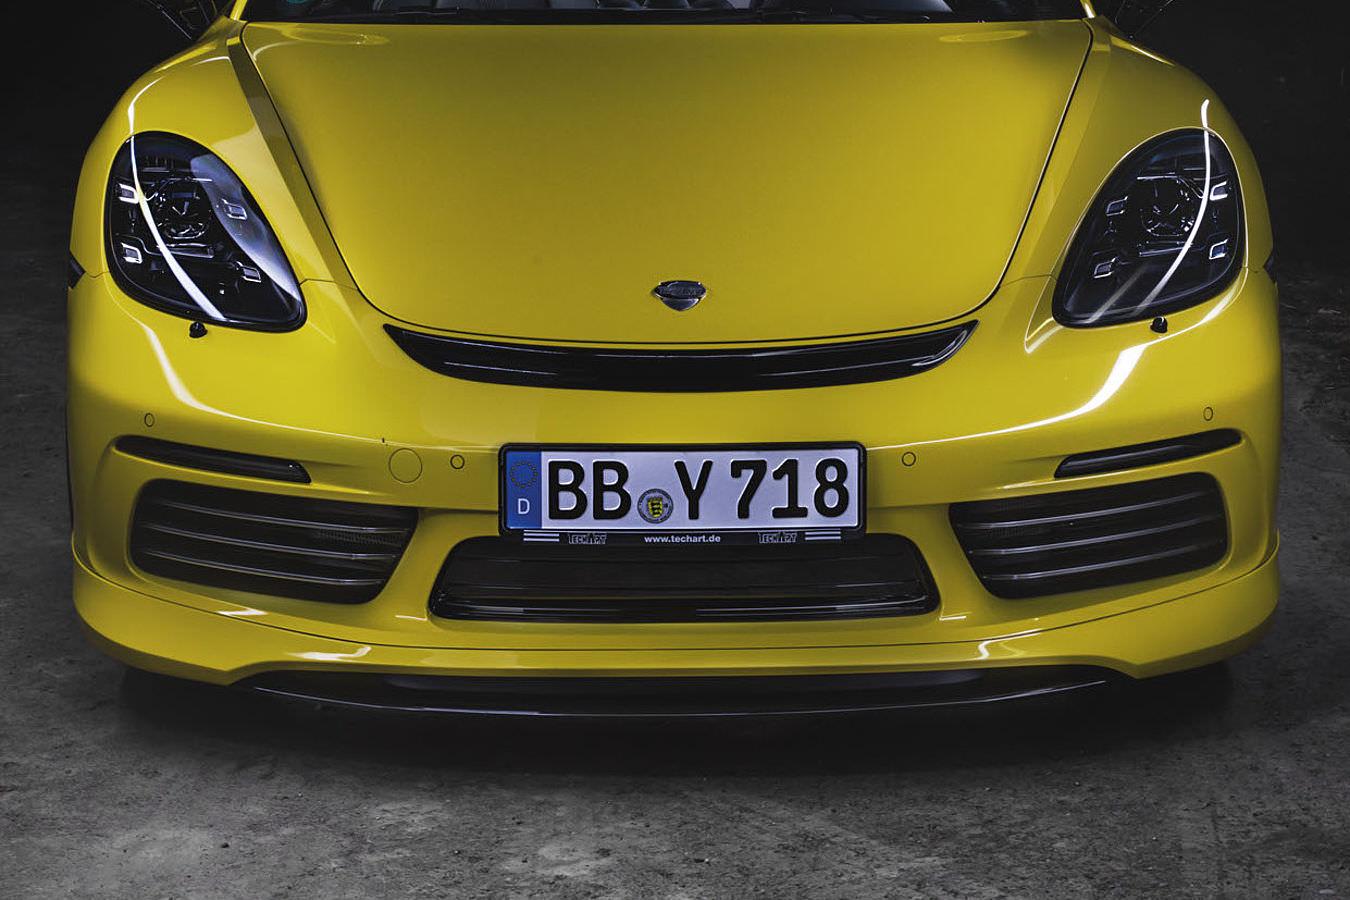 Techart Porsche 718 Cayman Boxster Pitlane Tuning Shop